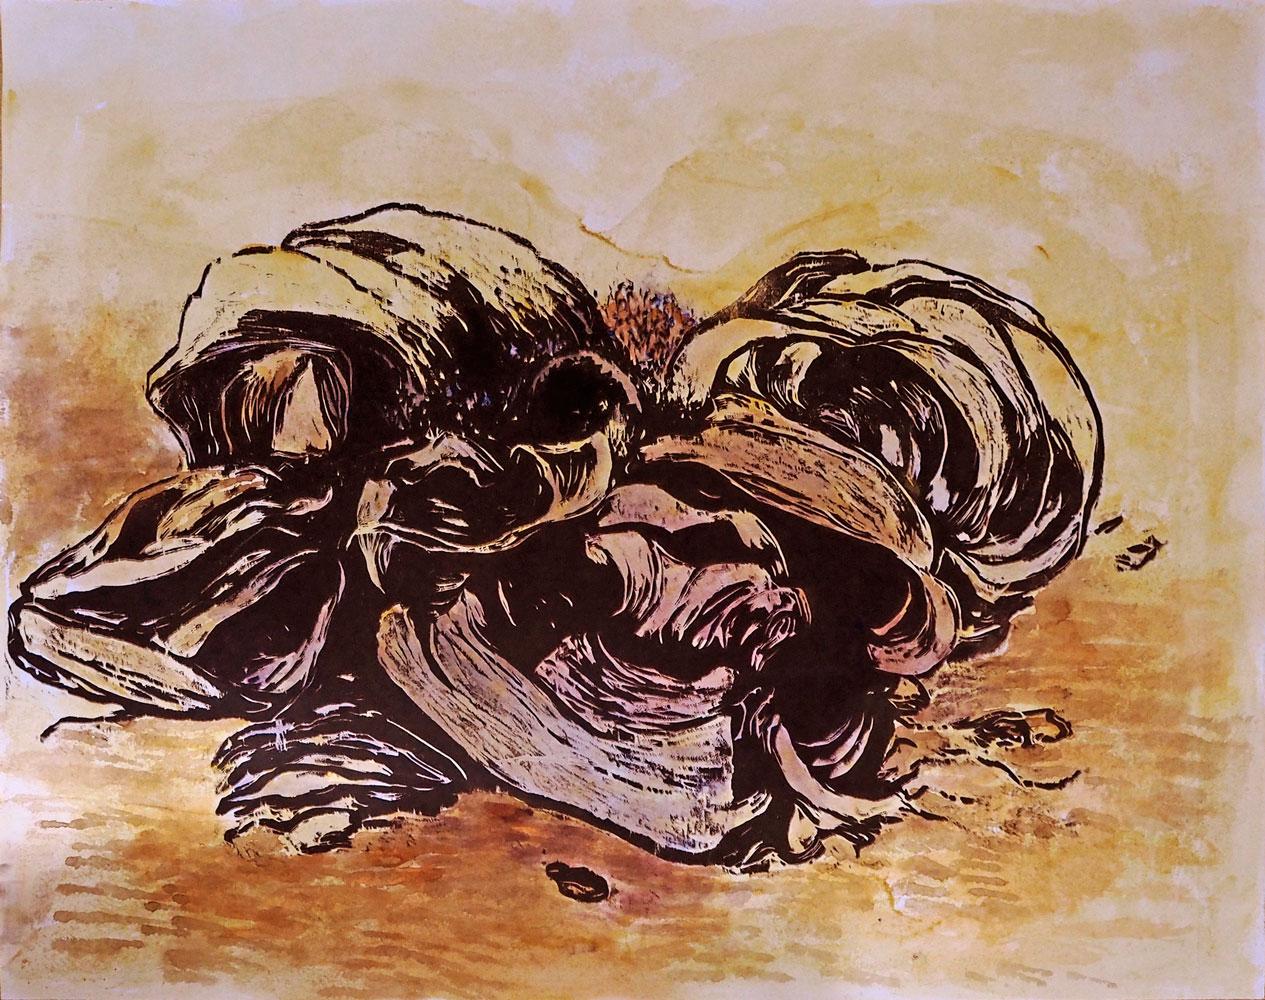 welwitschia II, 2019, carborundum print and acryl, 76 x 90 cm